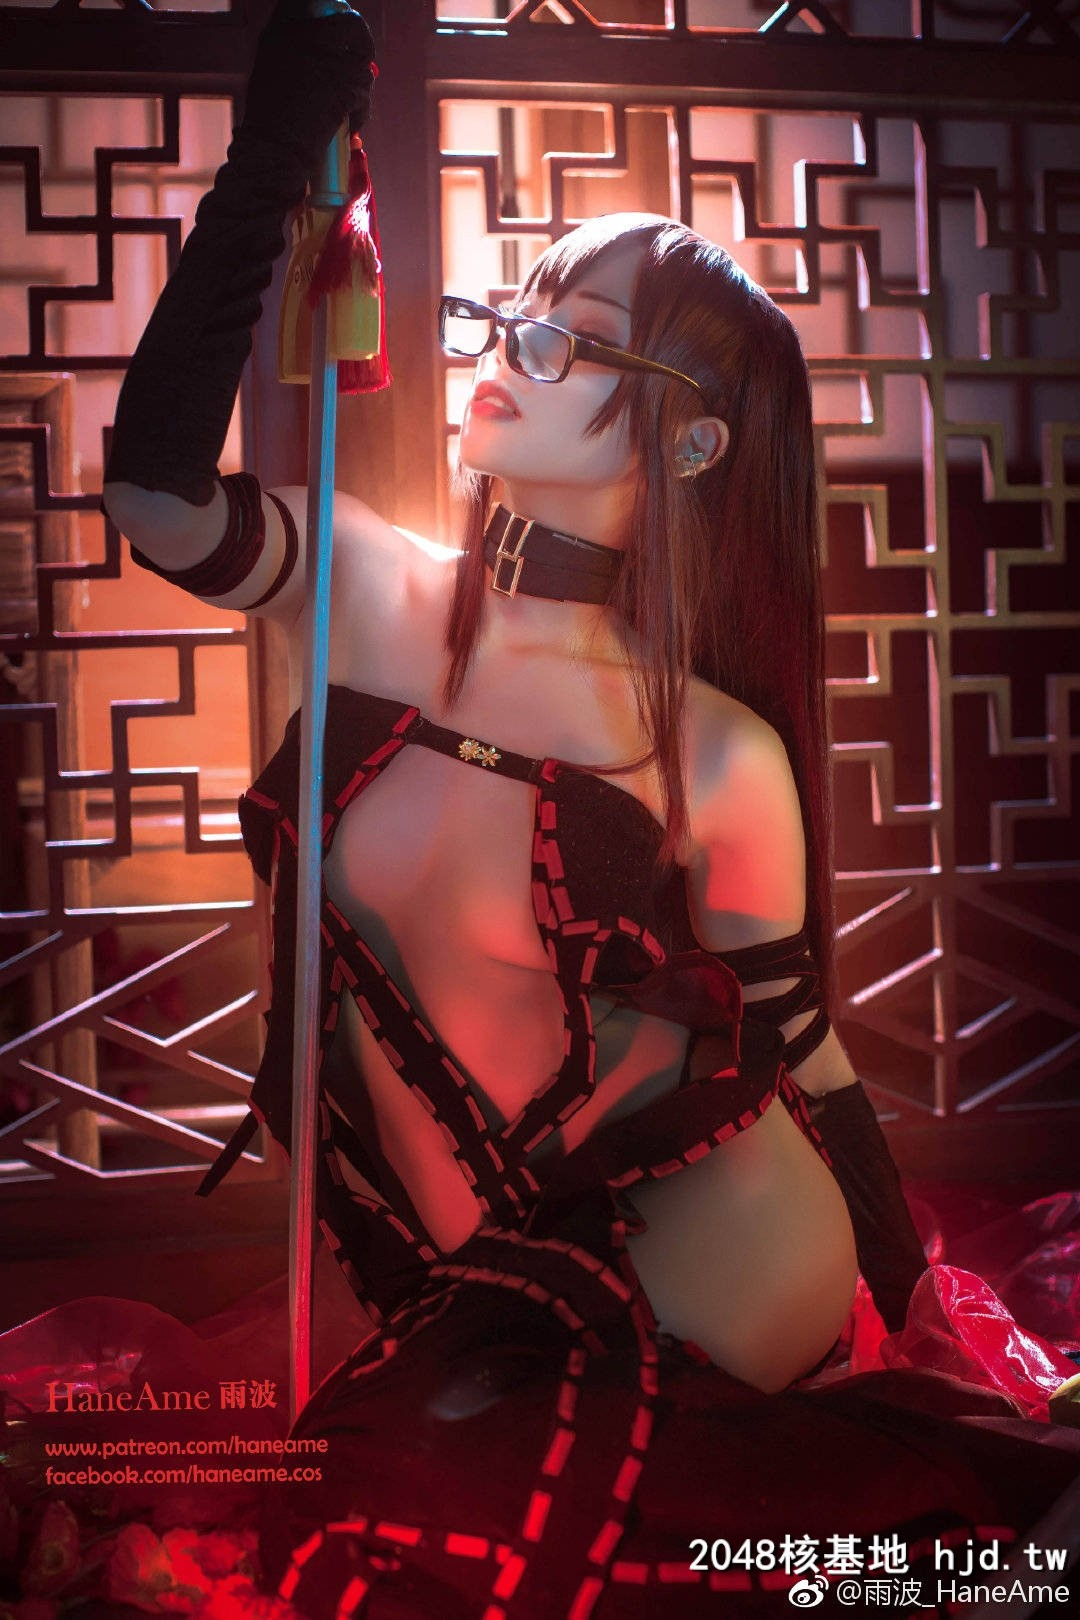 Fate/GrandOrder虞姬 虞美人【宅次元】 (29P)插图(7)